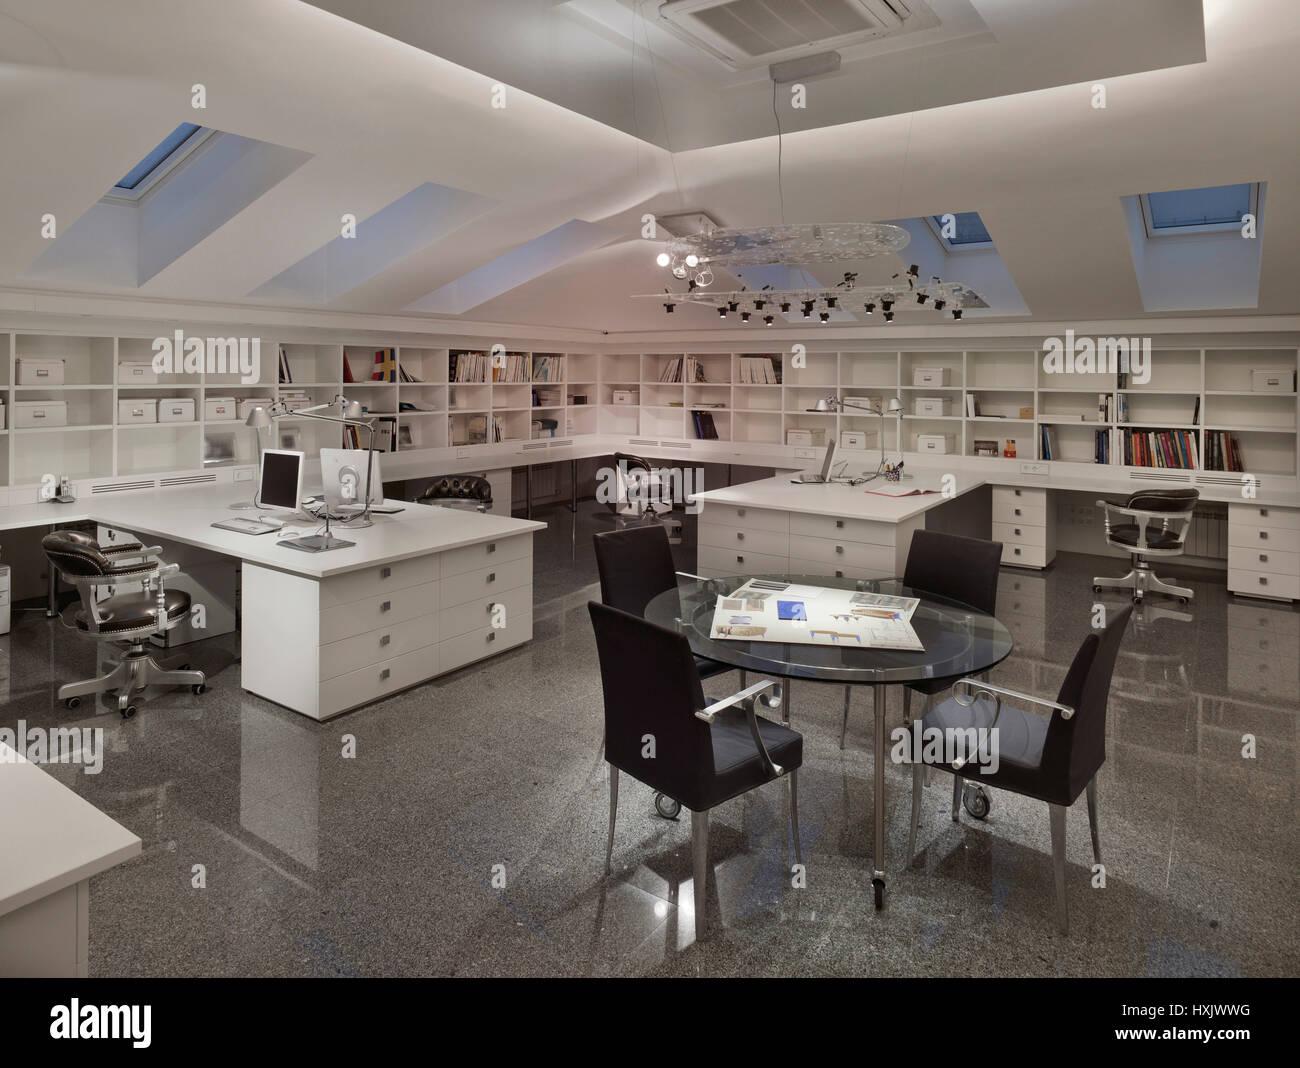 Oficina de arquitectura, firme, oficina, interior, mesa, diseño, lugar de trabajo, Moscú, buhardilla, Imagen De Stock